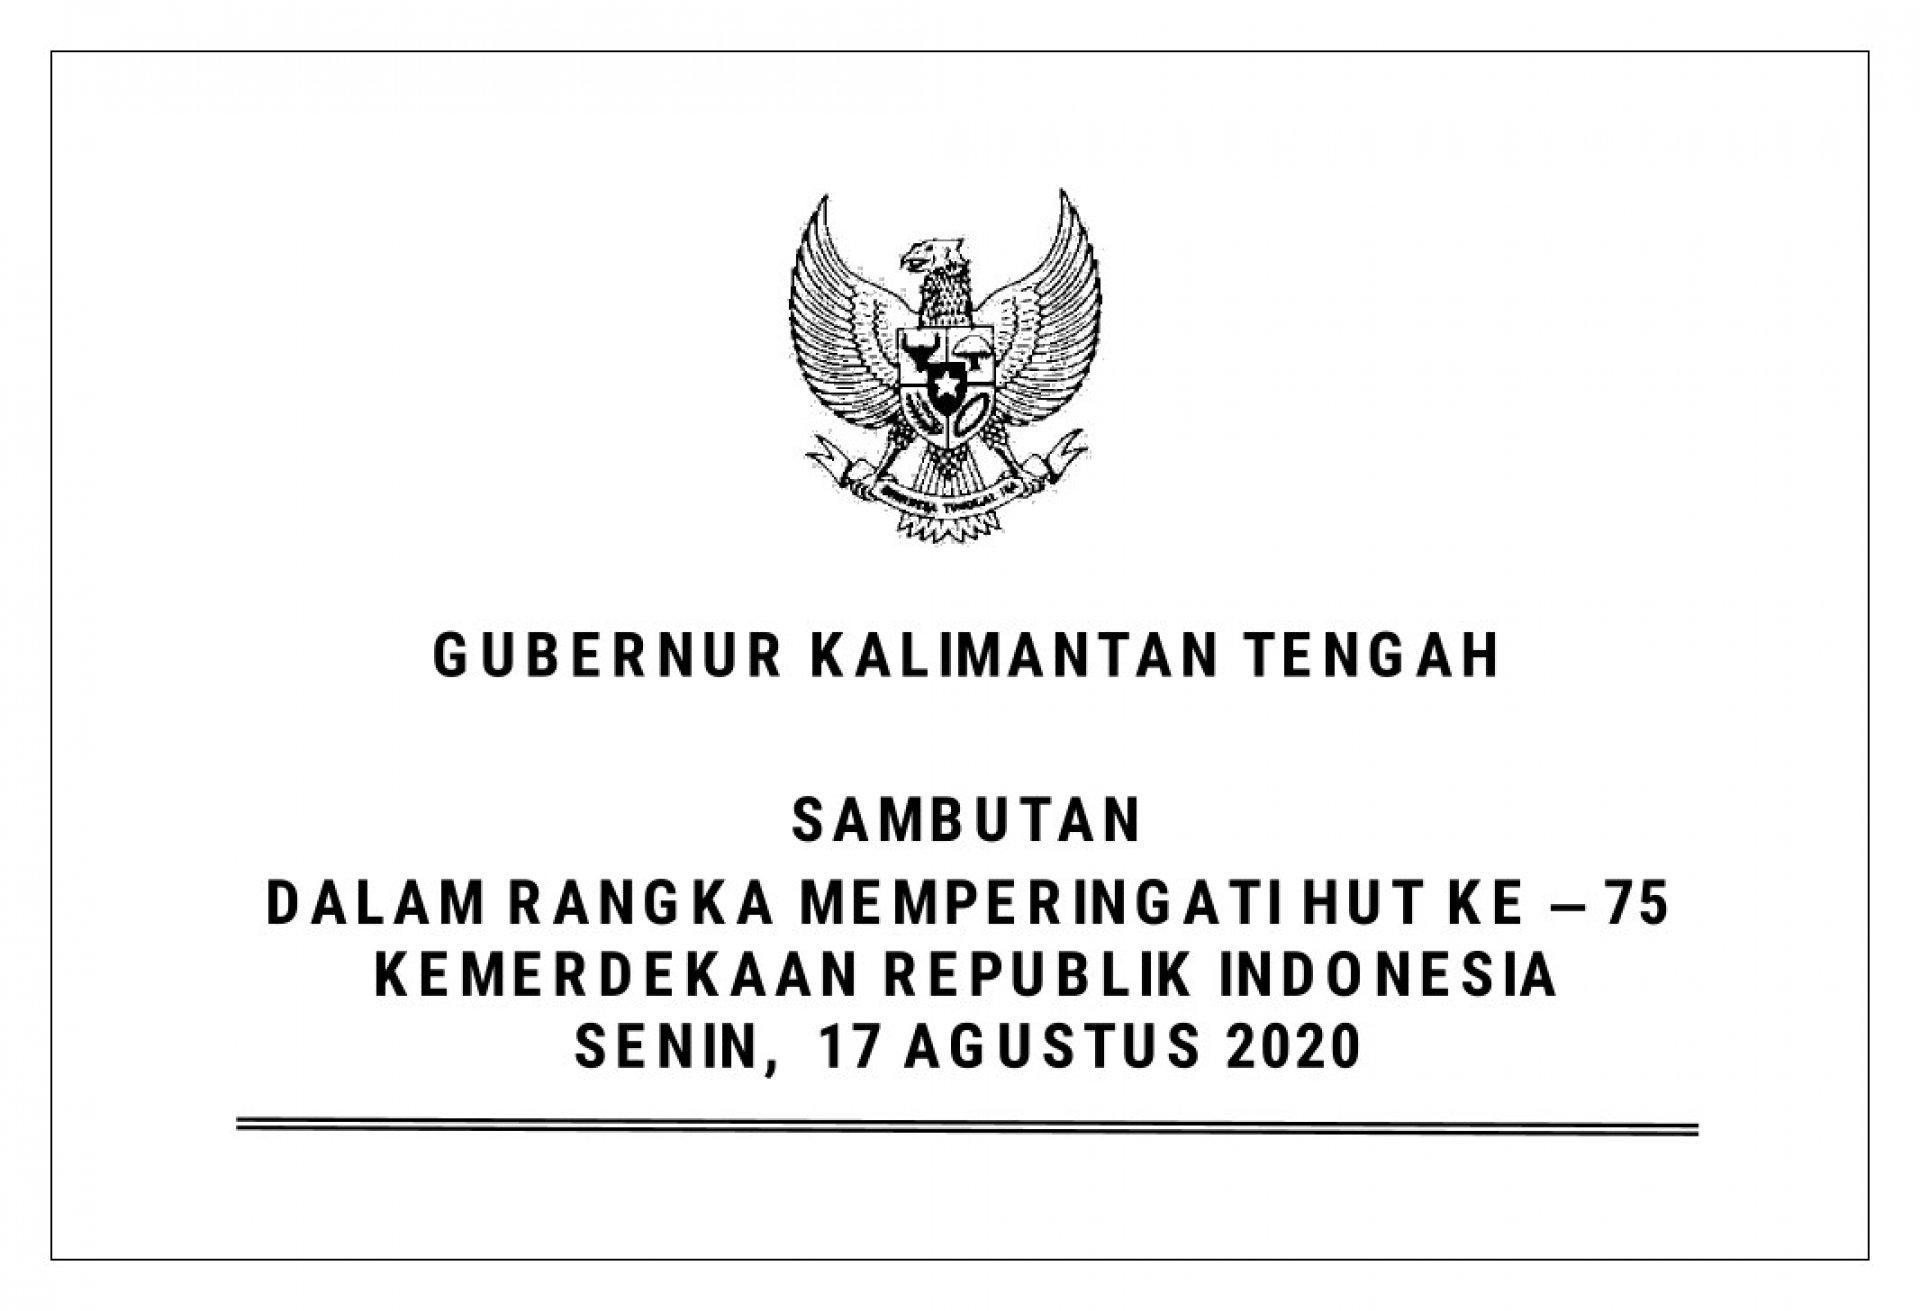 Sambutan Gubernur Kalimantan Tengah dalam rangka Peringatan HUT ke-75 Kemerdekaan Republik Indonesia